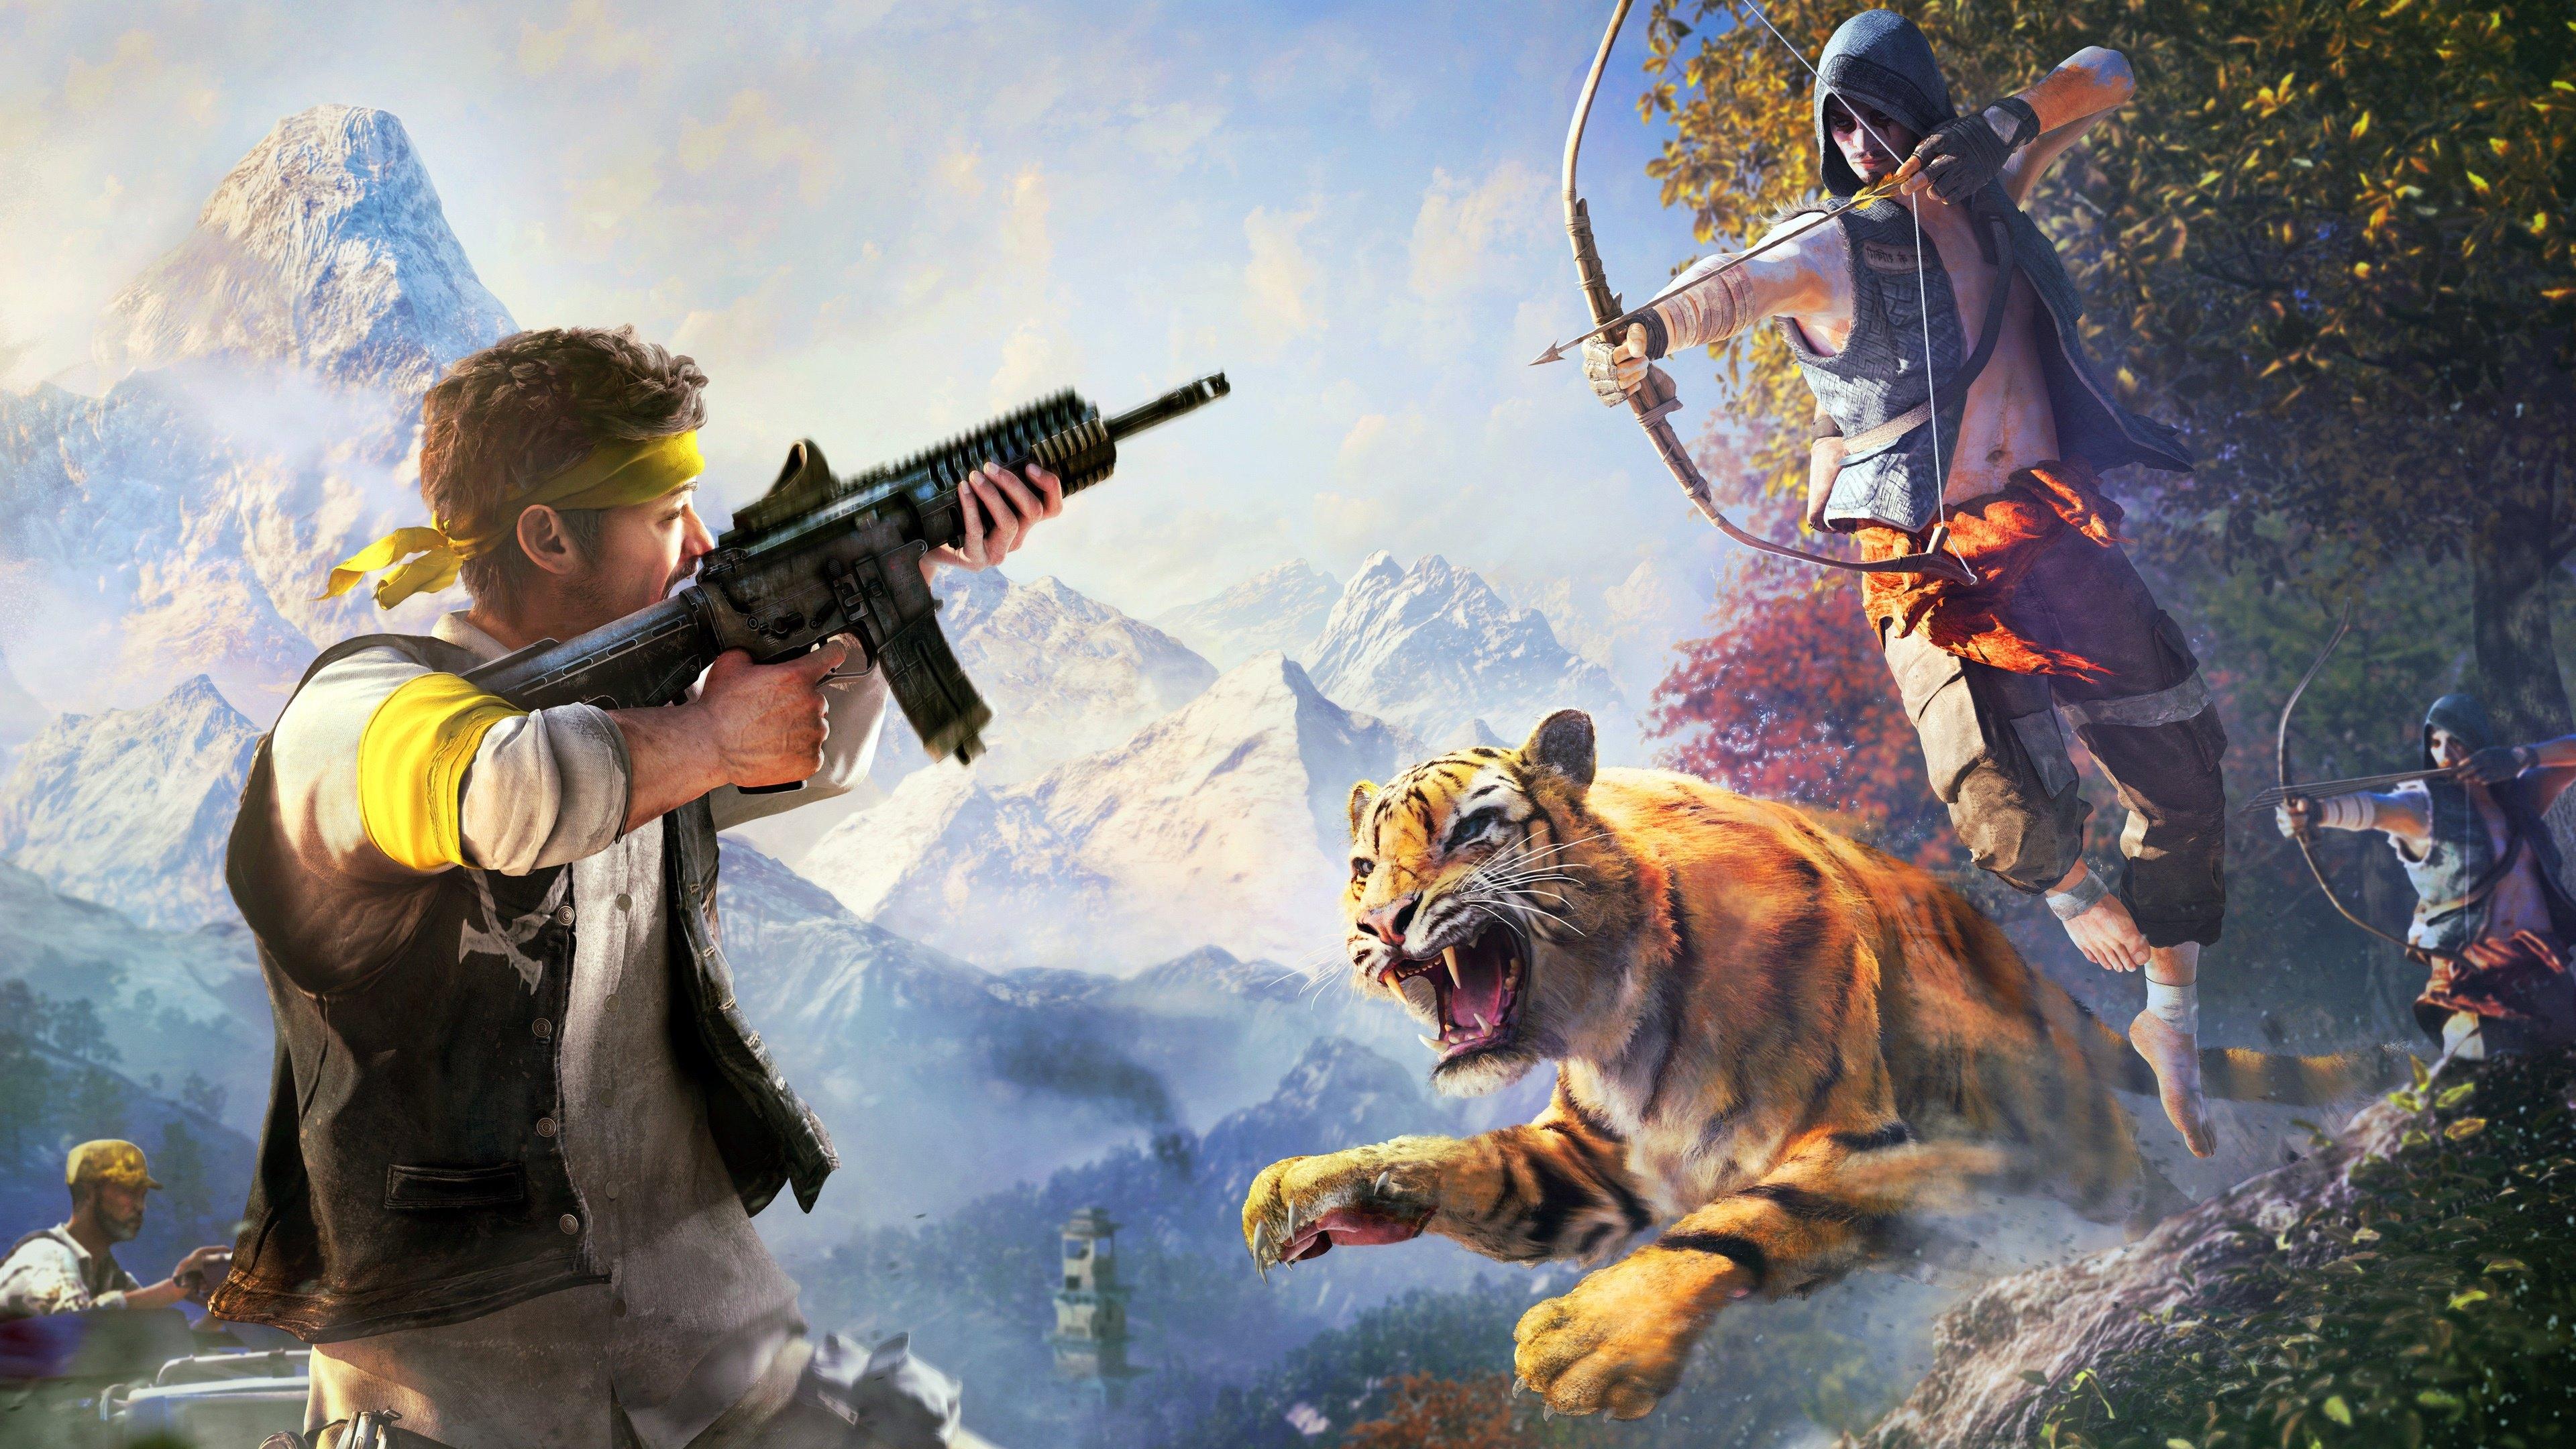 Video Game Screenshot Far Cry 4 HD Wallpapers 4K Wallpapers 3840x2160